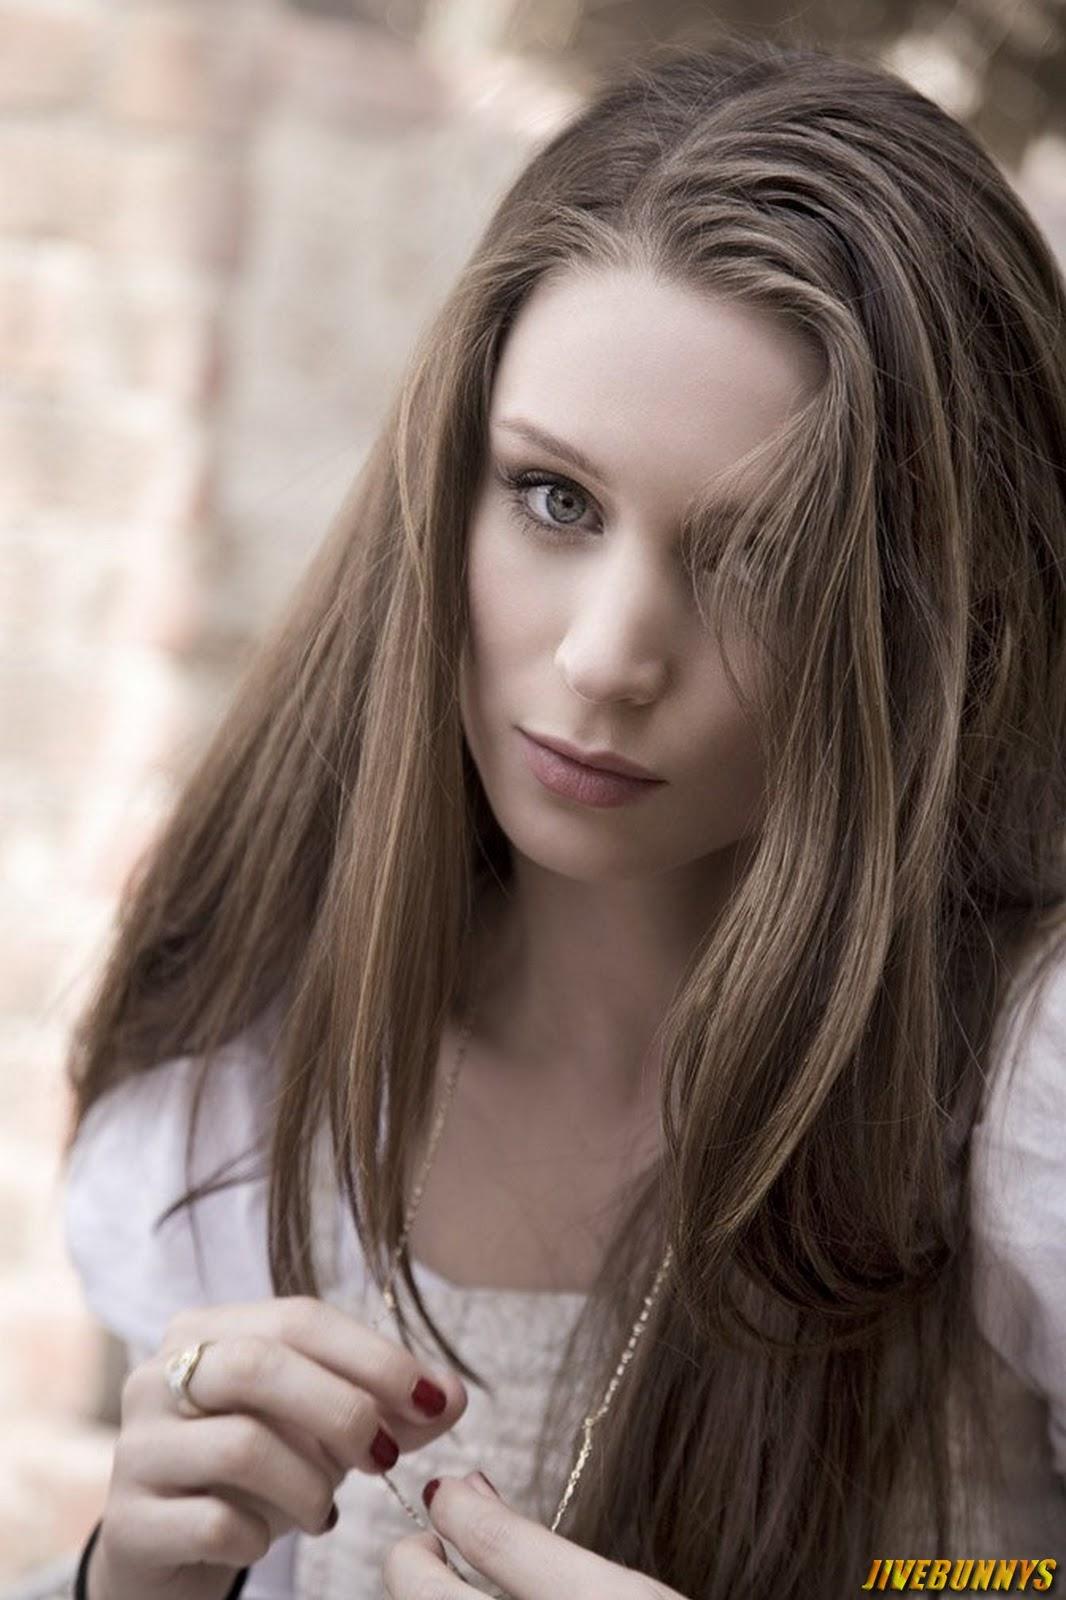 Rooney Mara Special Pictures 5 Film Actresses